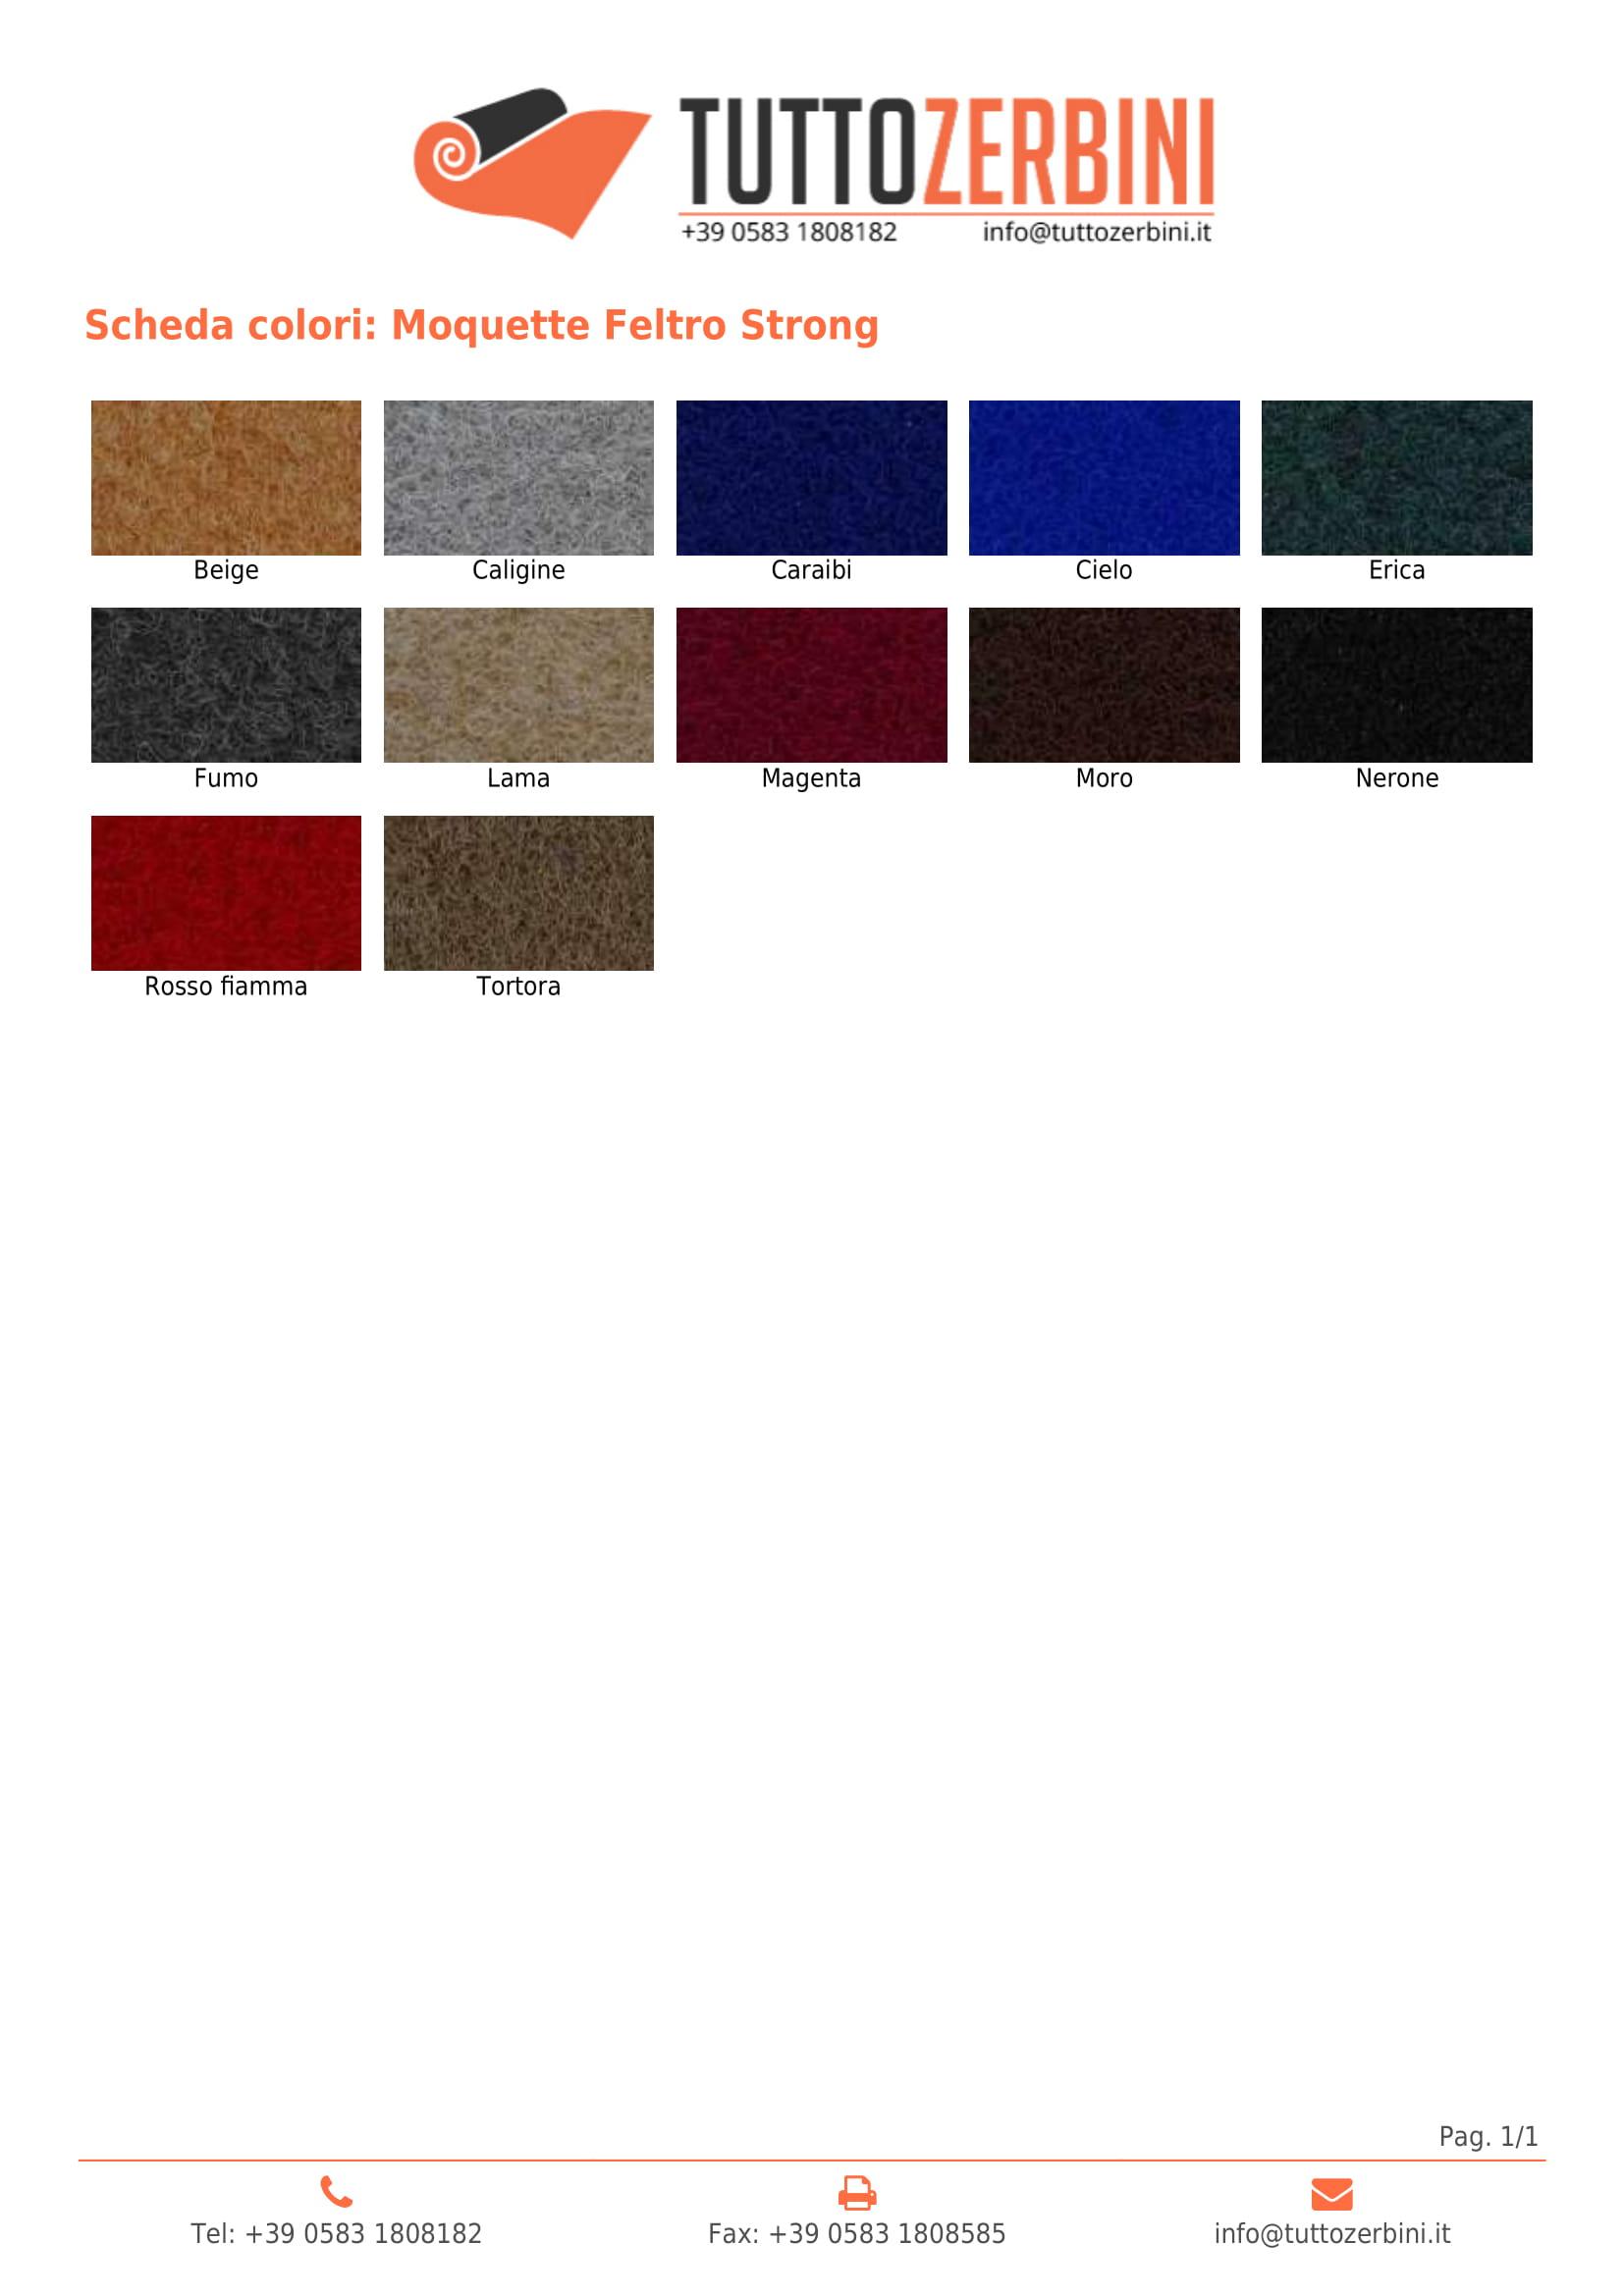 Scheda colori Moquette in feltro Strong